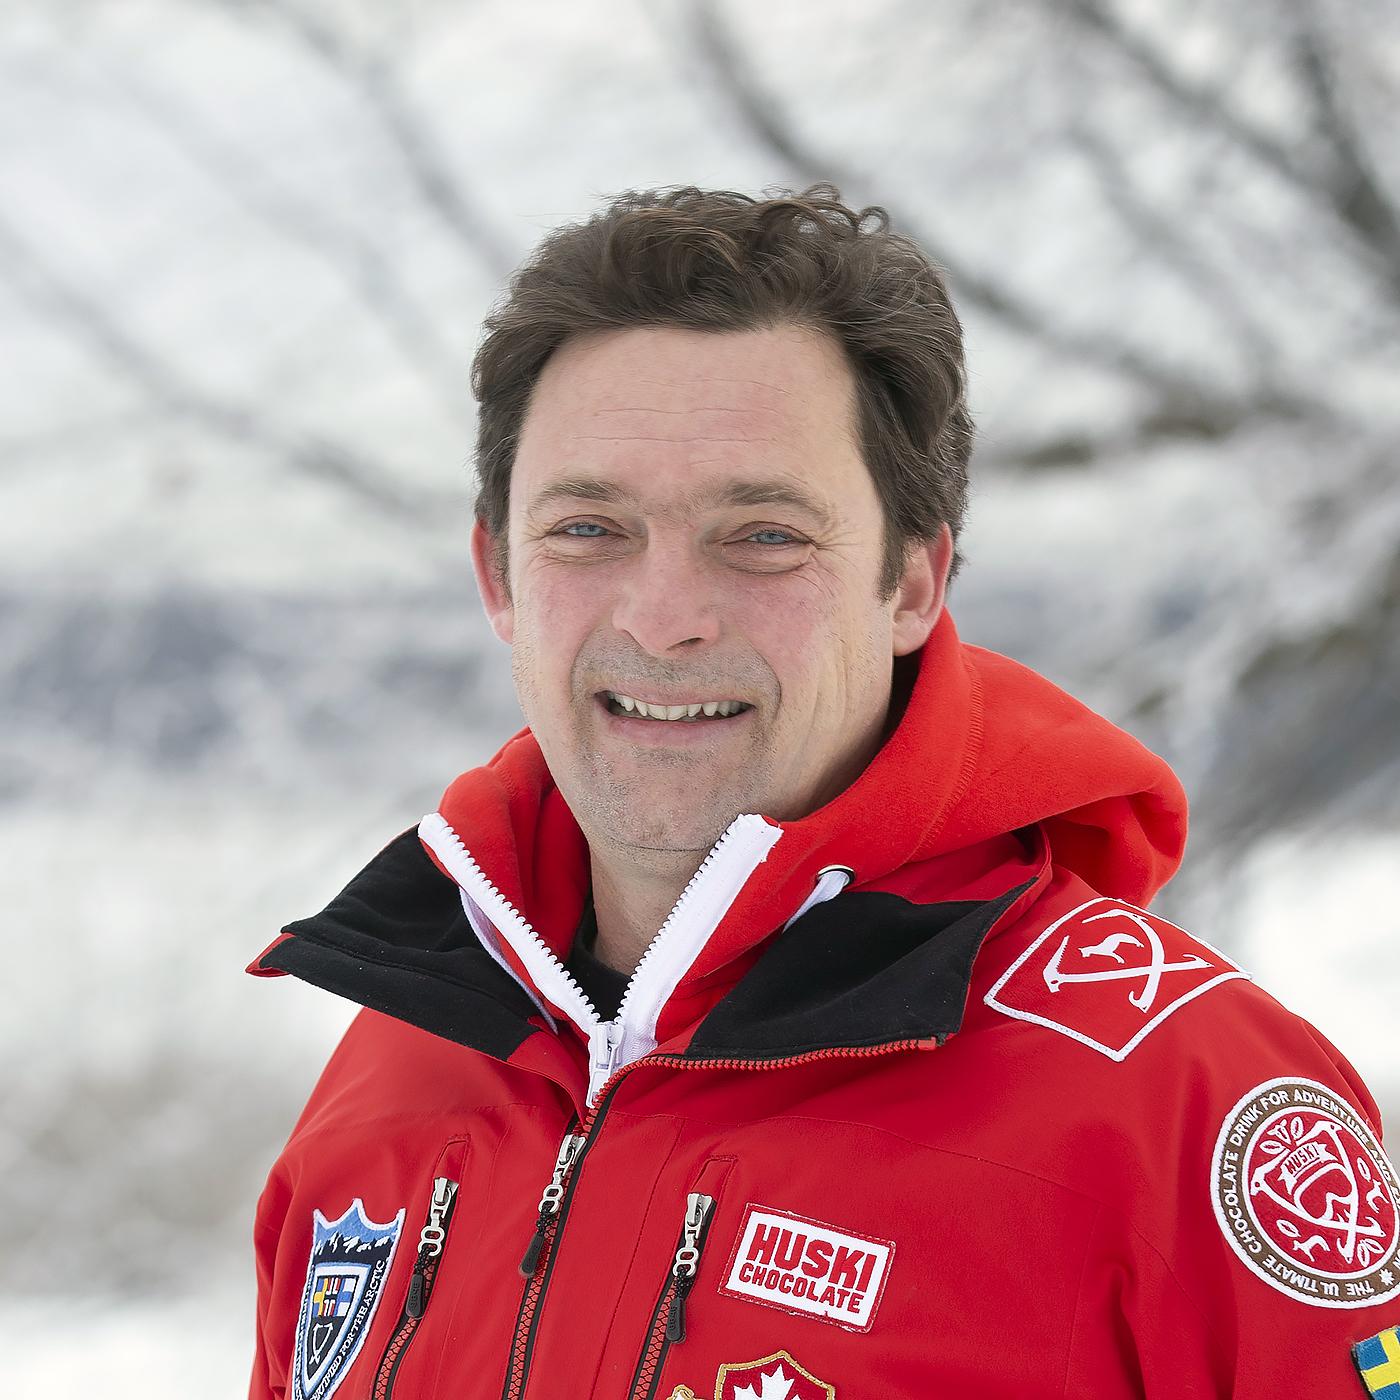 FREDRIK VON ESSEN Chairman of the Board / Sales HUSKI CHOCOLATE fredrik@huskichocolate.com +46 73 688 92 21